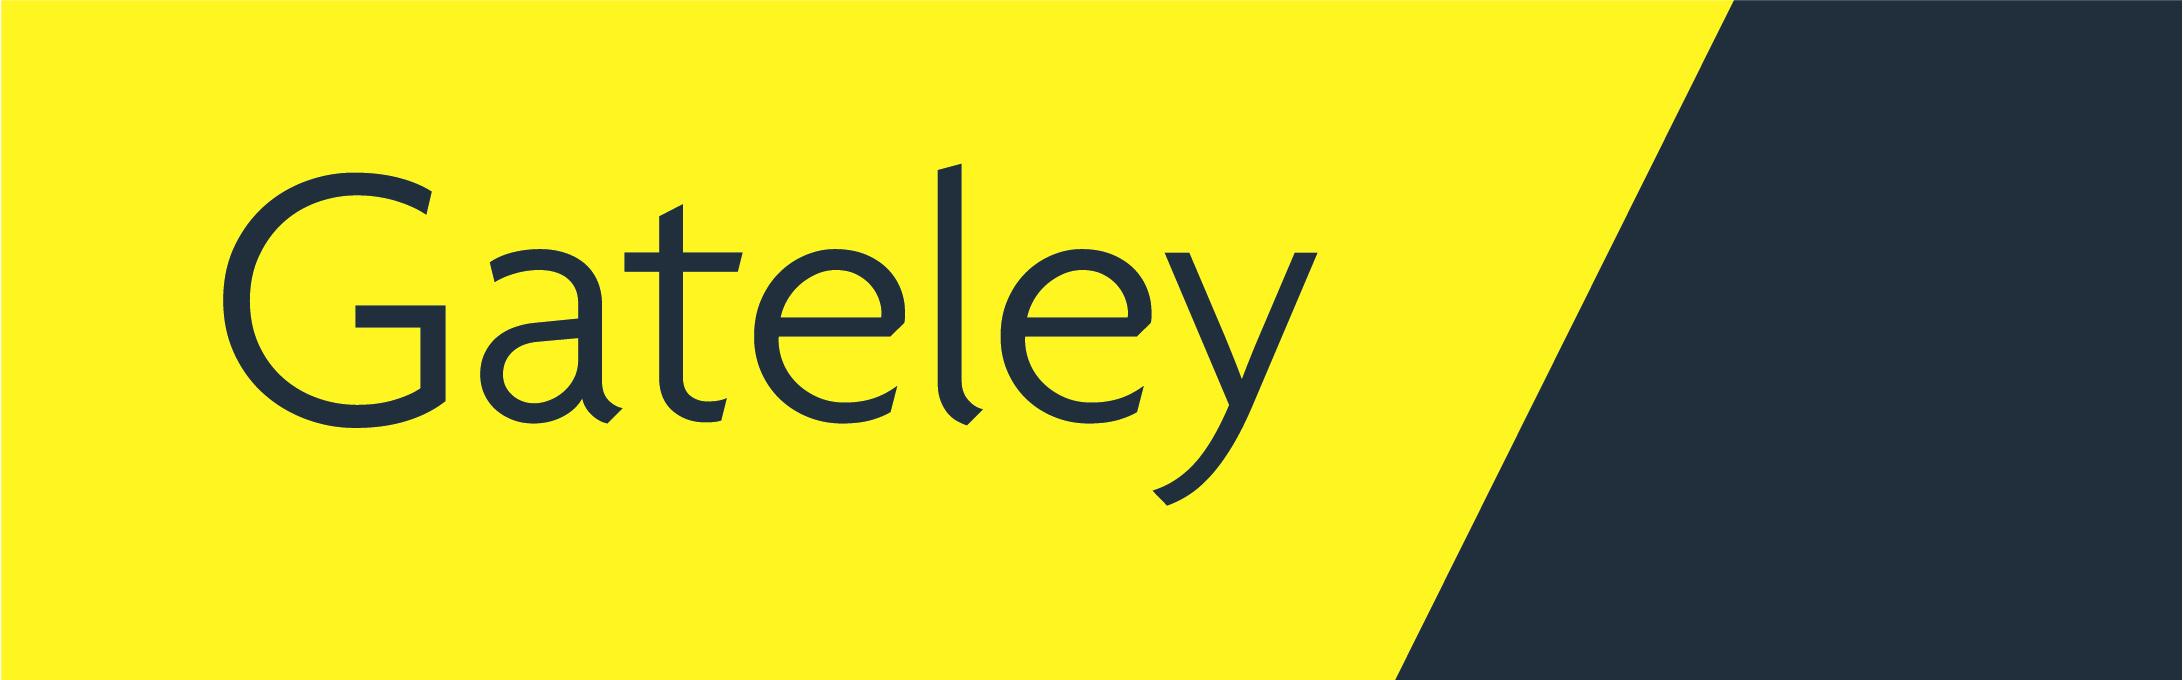 https://www.pro-manchester.co.uk/wp-content/uploads/2020/03/Gateley_Bounding-Box.jpg